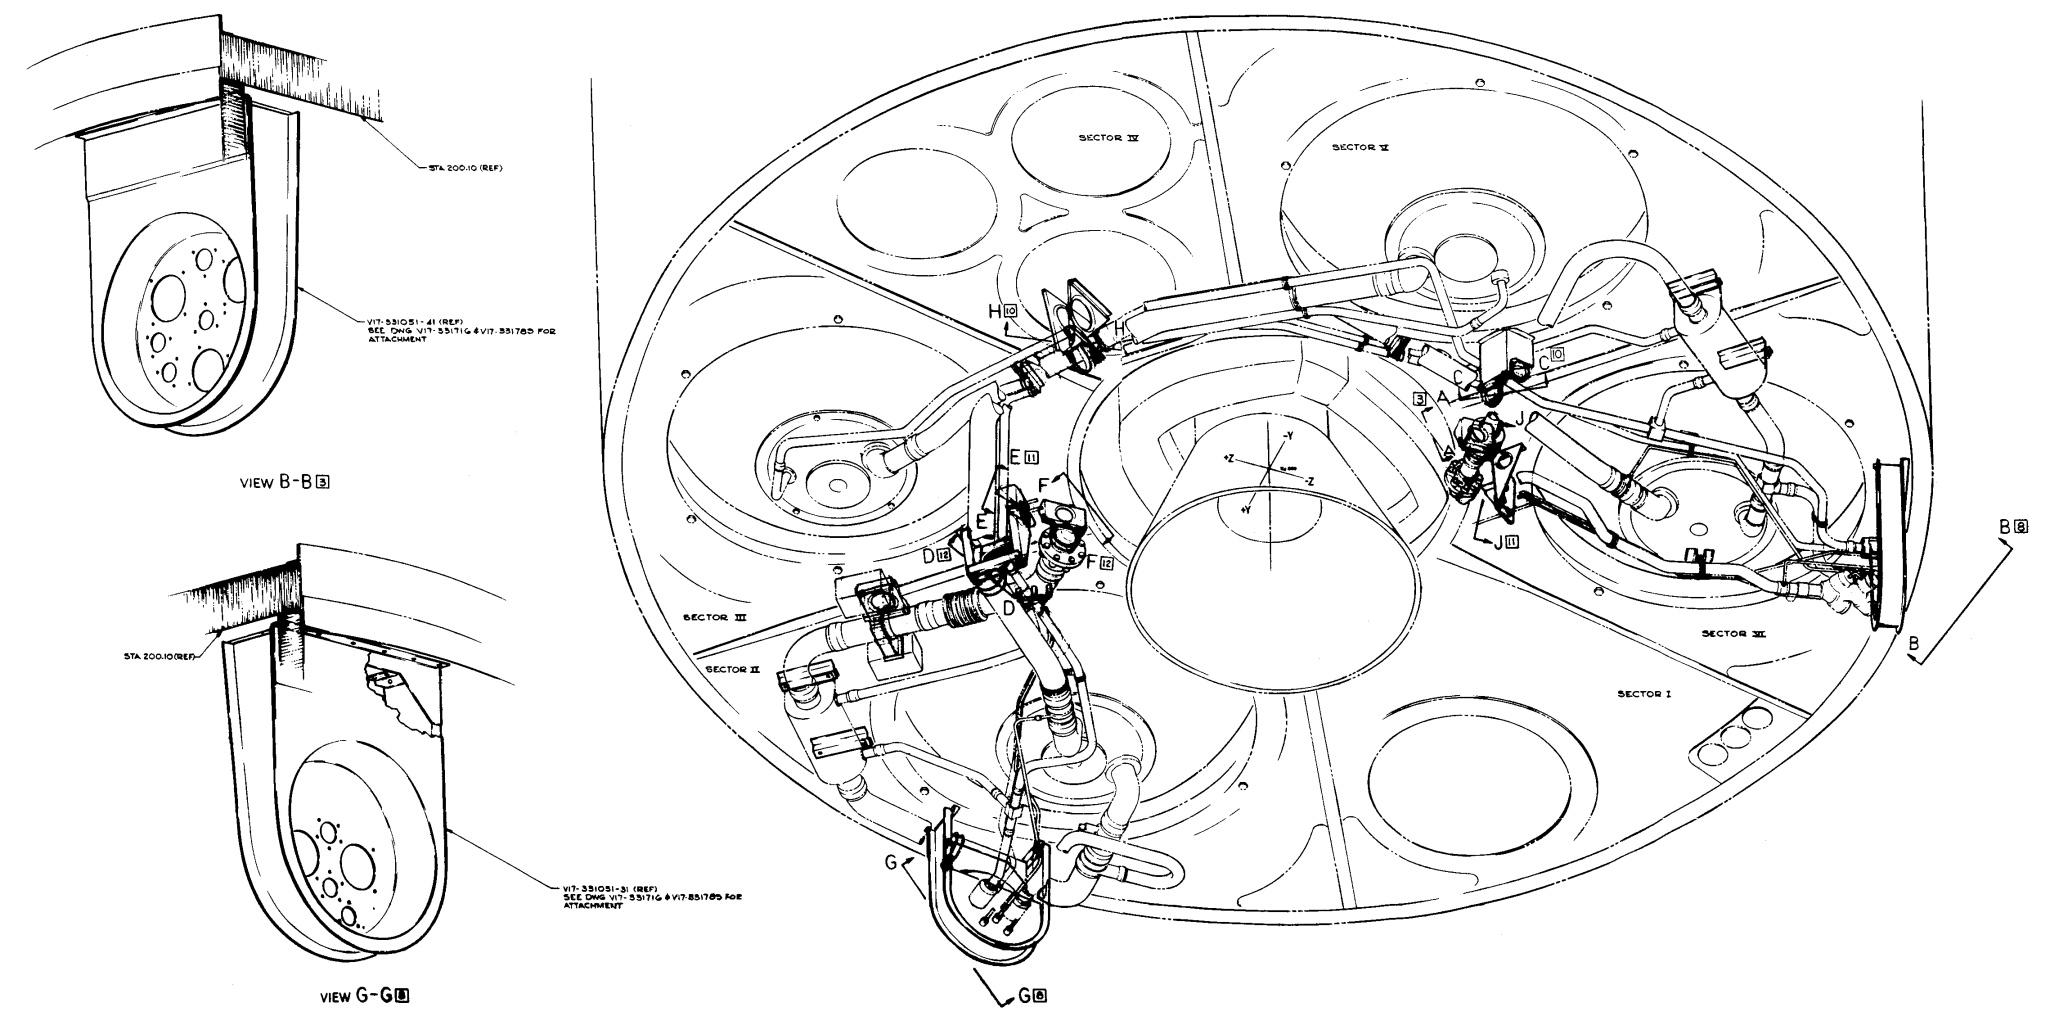 Apollo Service Module Service Propulsion System Sps Servicing Connections